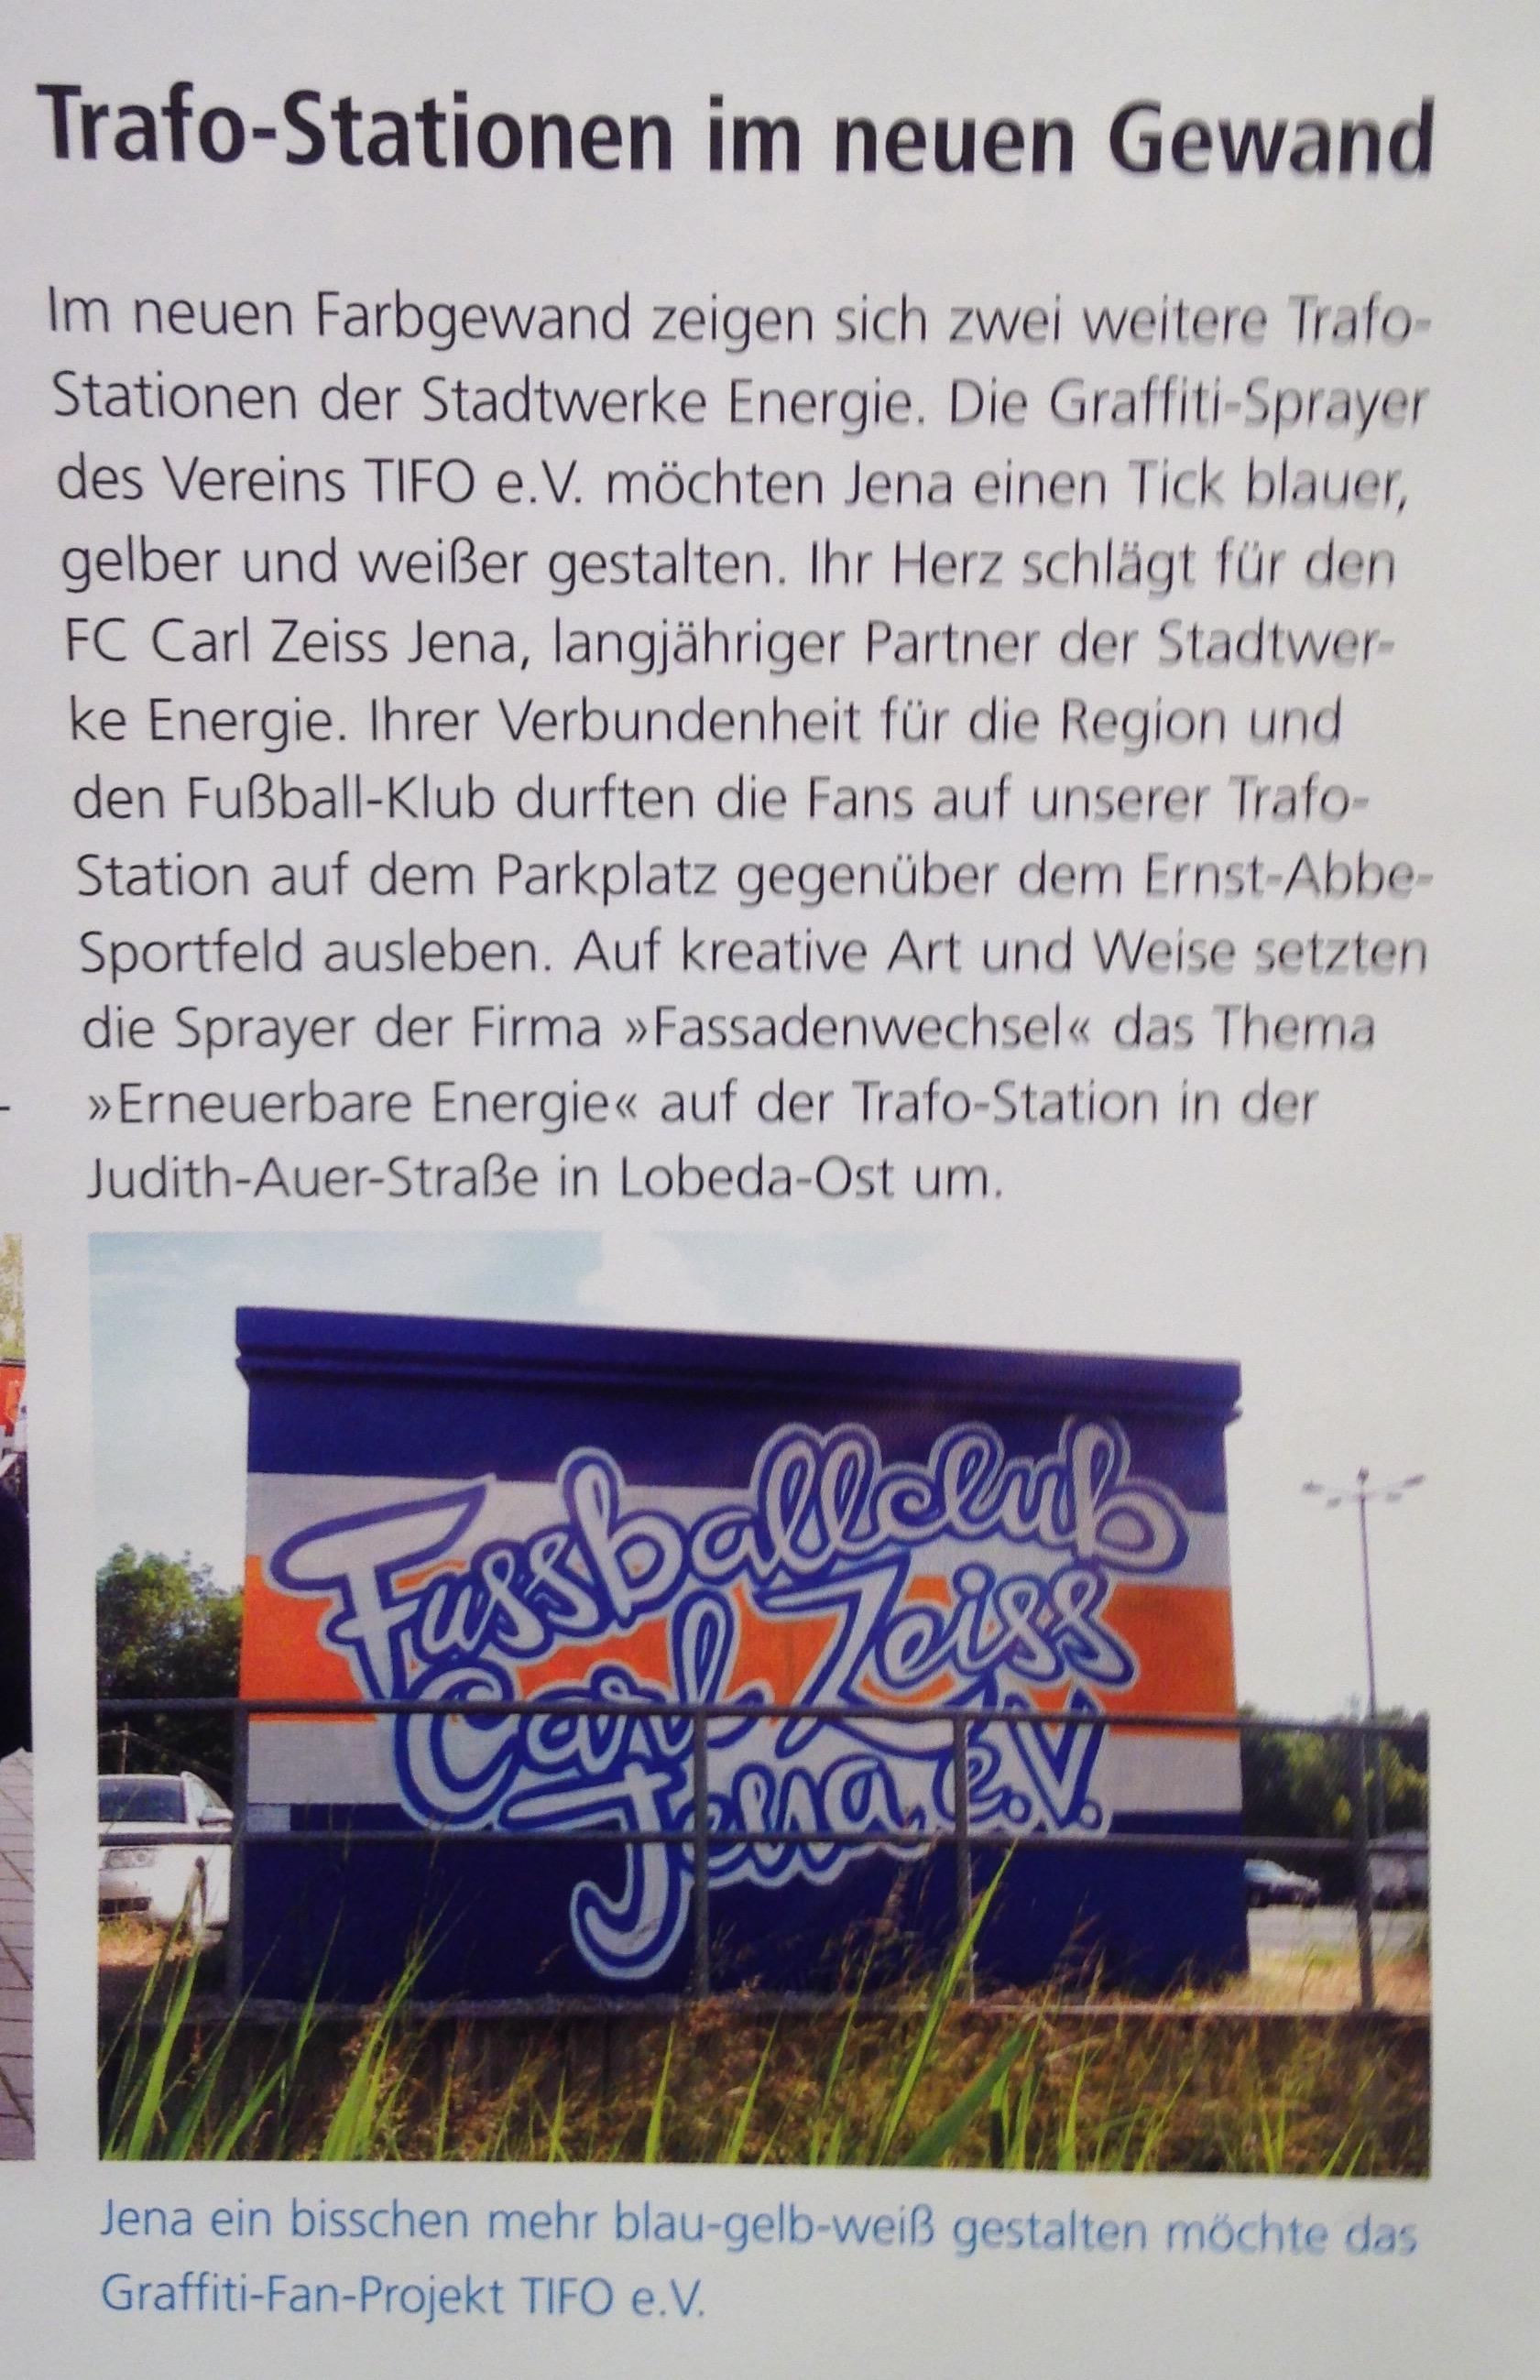 StadtwerkeMagazin 2-2014